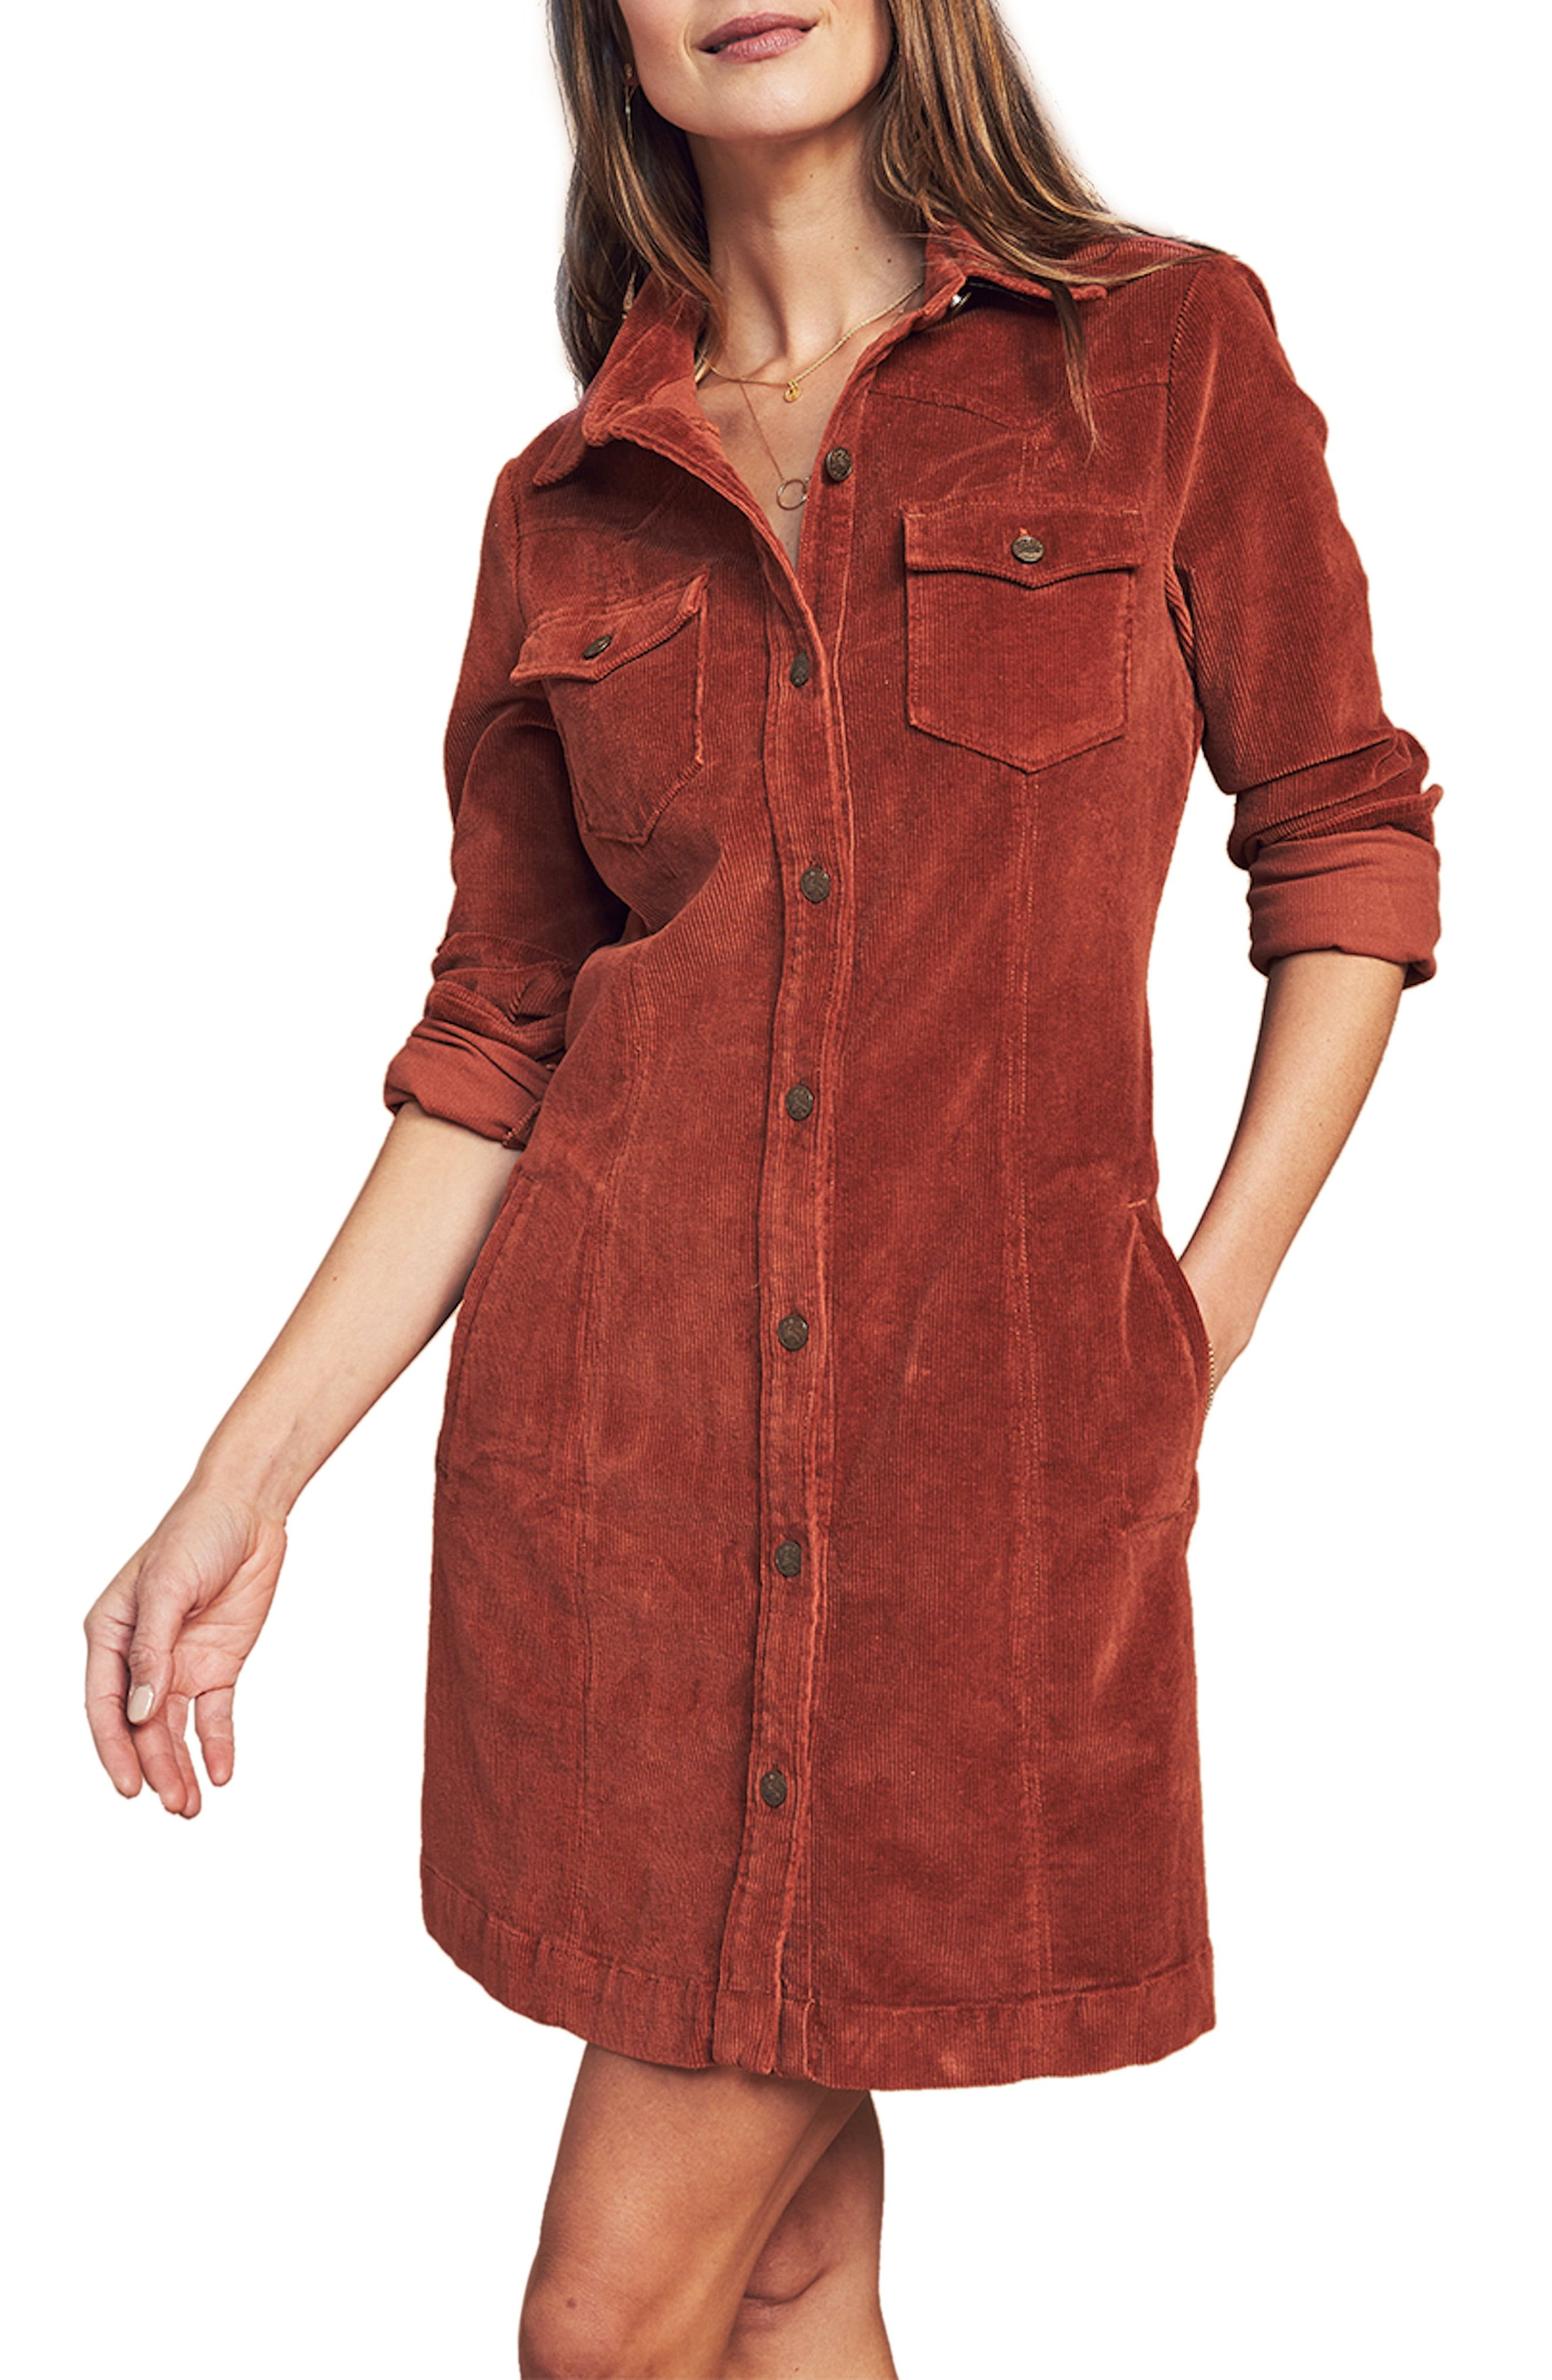 Faherty Malone Long Sleeve Corduroy Shirtdress Nordstrom In 2021 Shirt Dress Faherty Long Sleeve [ 4048 x 2640 Pixel ]